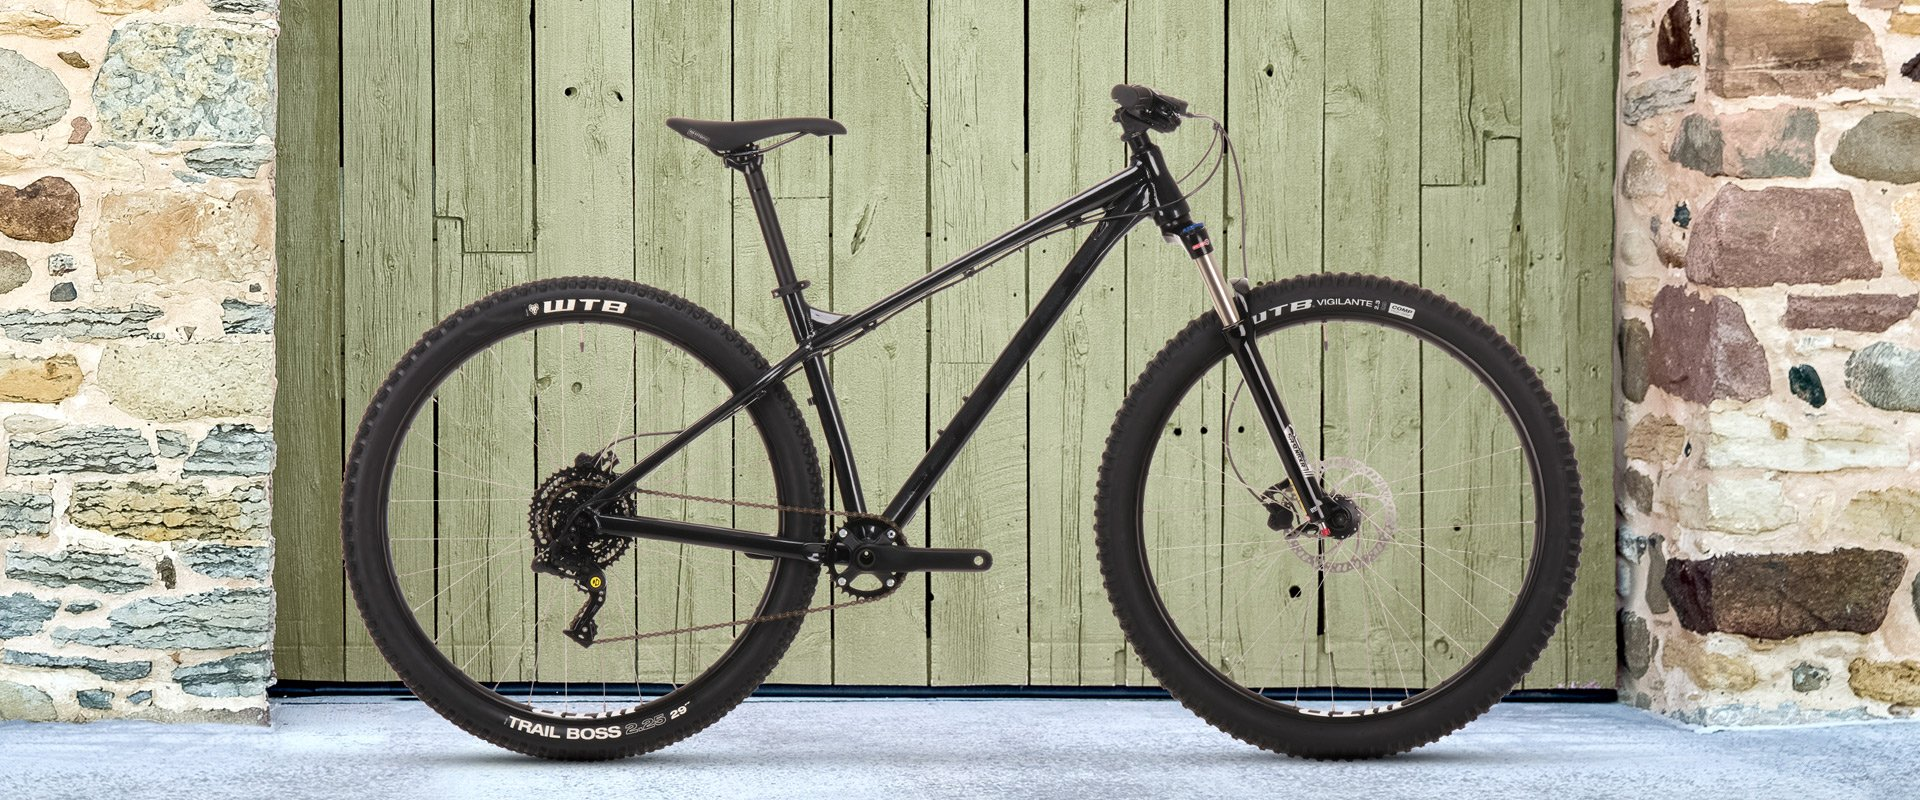 Vitus Nucleus 29 VR Mountain Bike   Blue